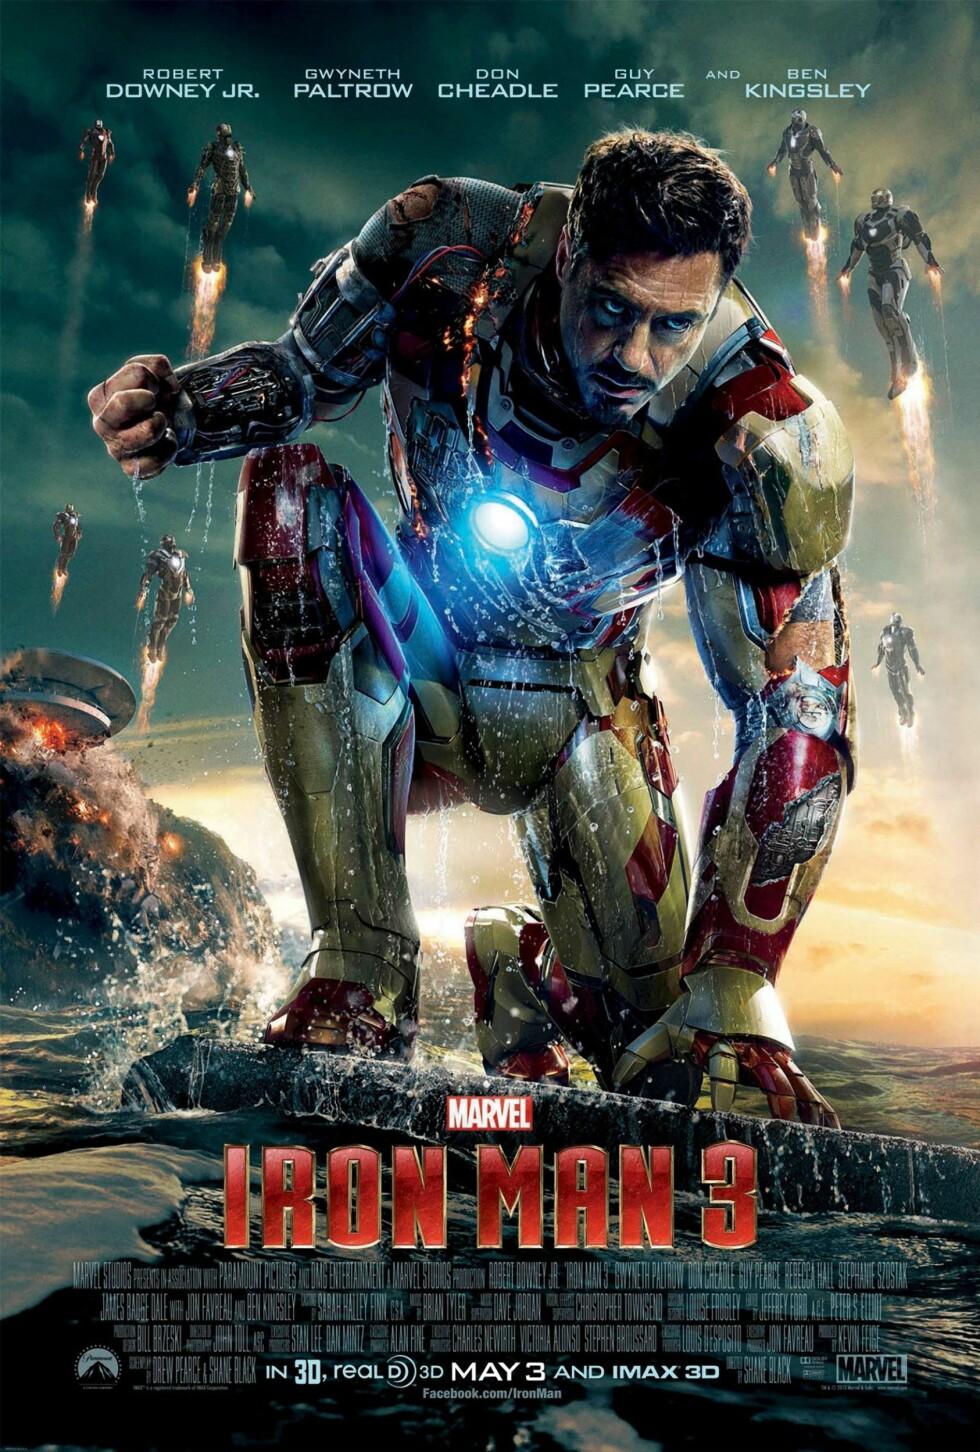 <strong>Iron man 3 (2013):</strong> tjente 1,21 milliarder dollar.  Foto: MARVEL STUDIOS / Album